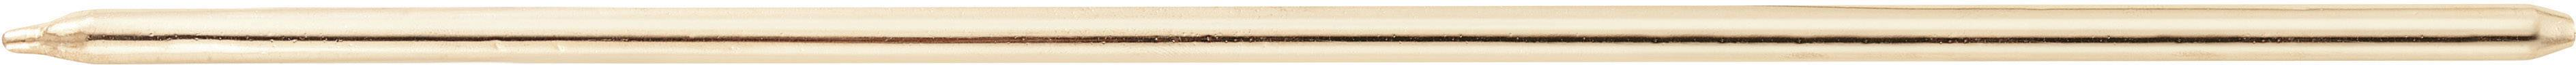 Teplovodivá trubka Sinter-Heatpipe Gelid CP-S8350-01, 40 W